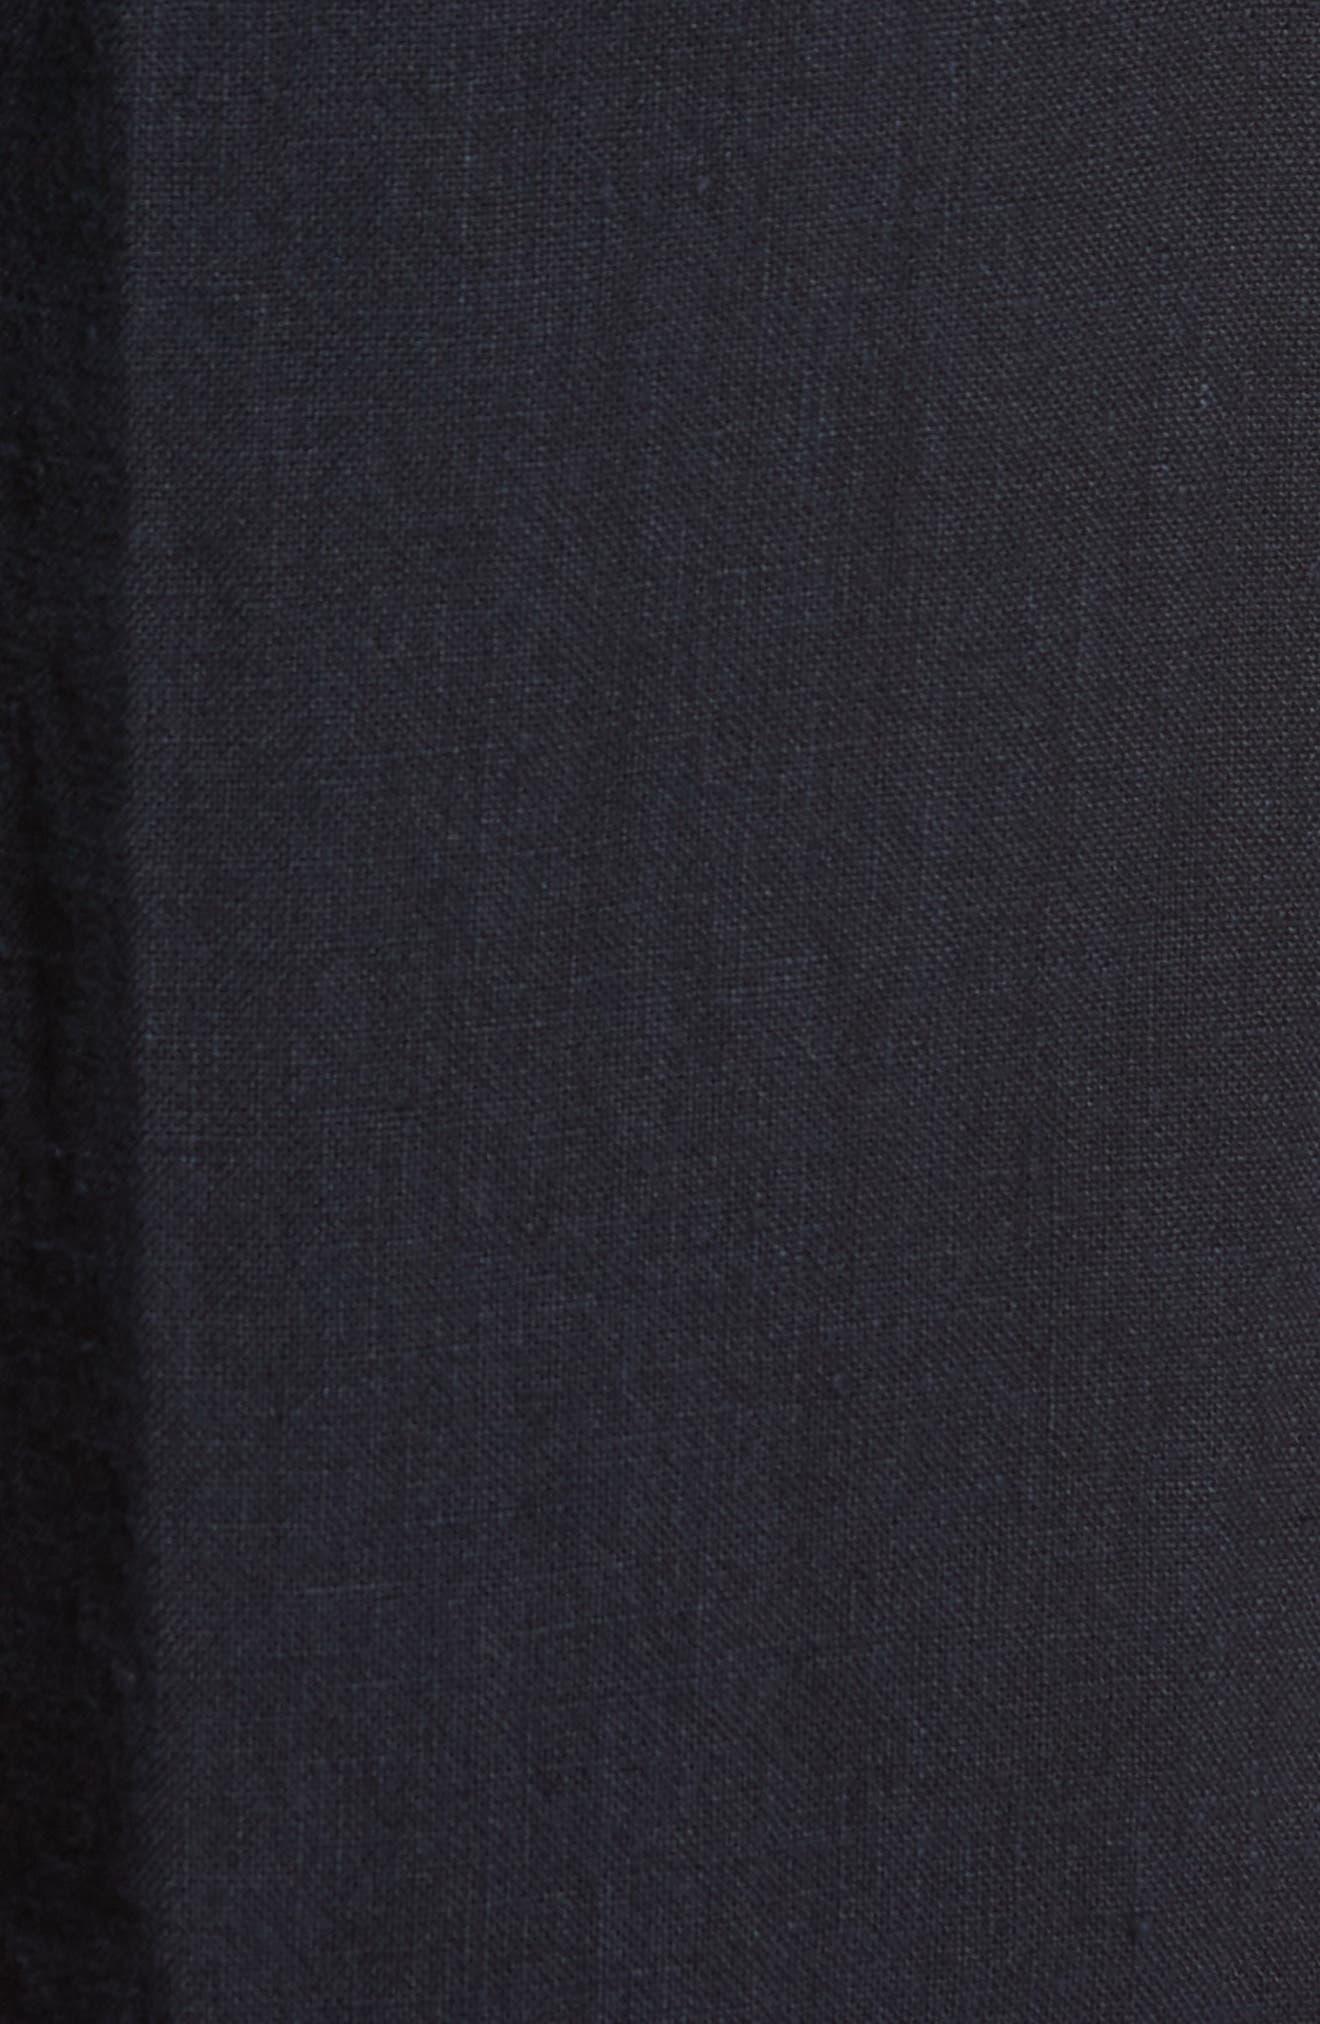 & Bros. Linen Shorts,                             Alternate thumbnail 5, color,                             400